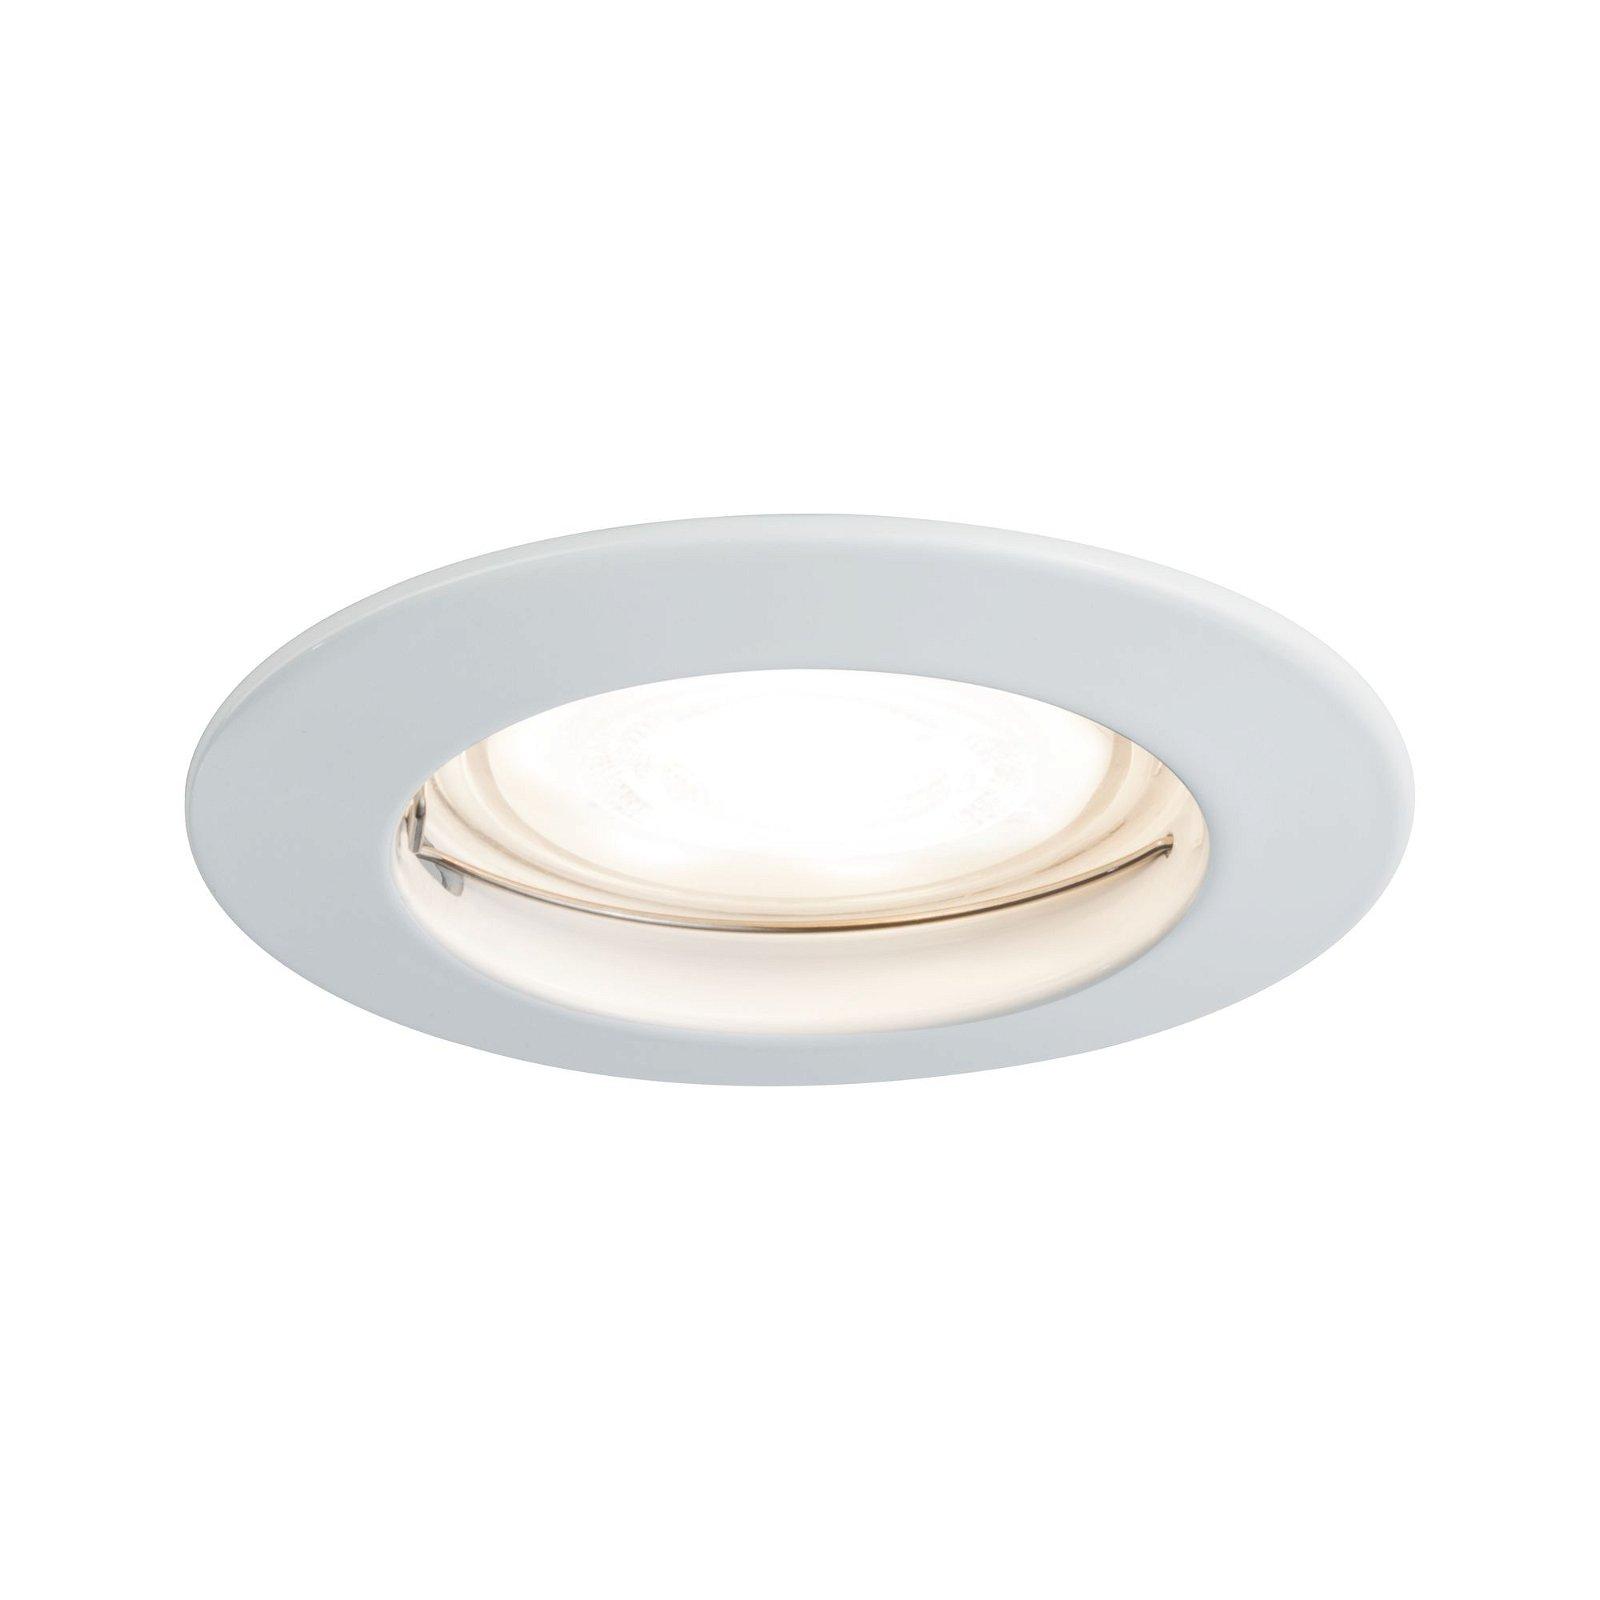 Premium Spot encastré LED IP44 rond 79mm GU10 max. 50W 230V Blanc